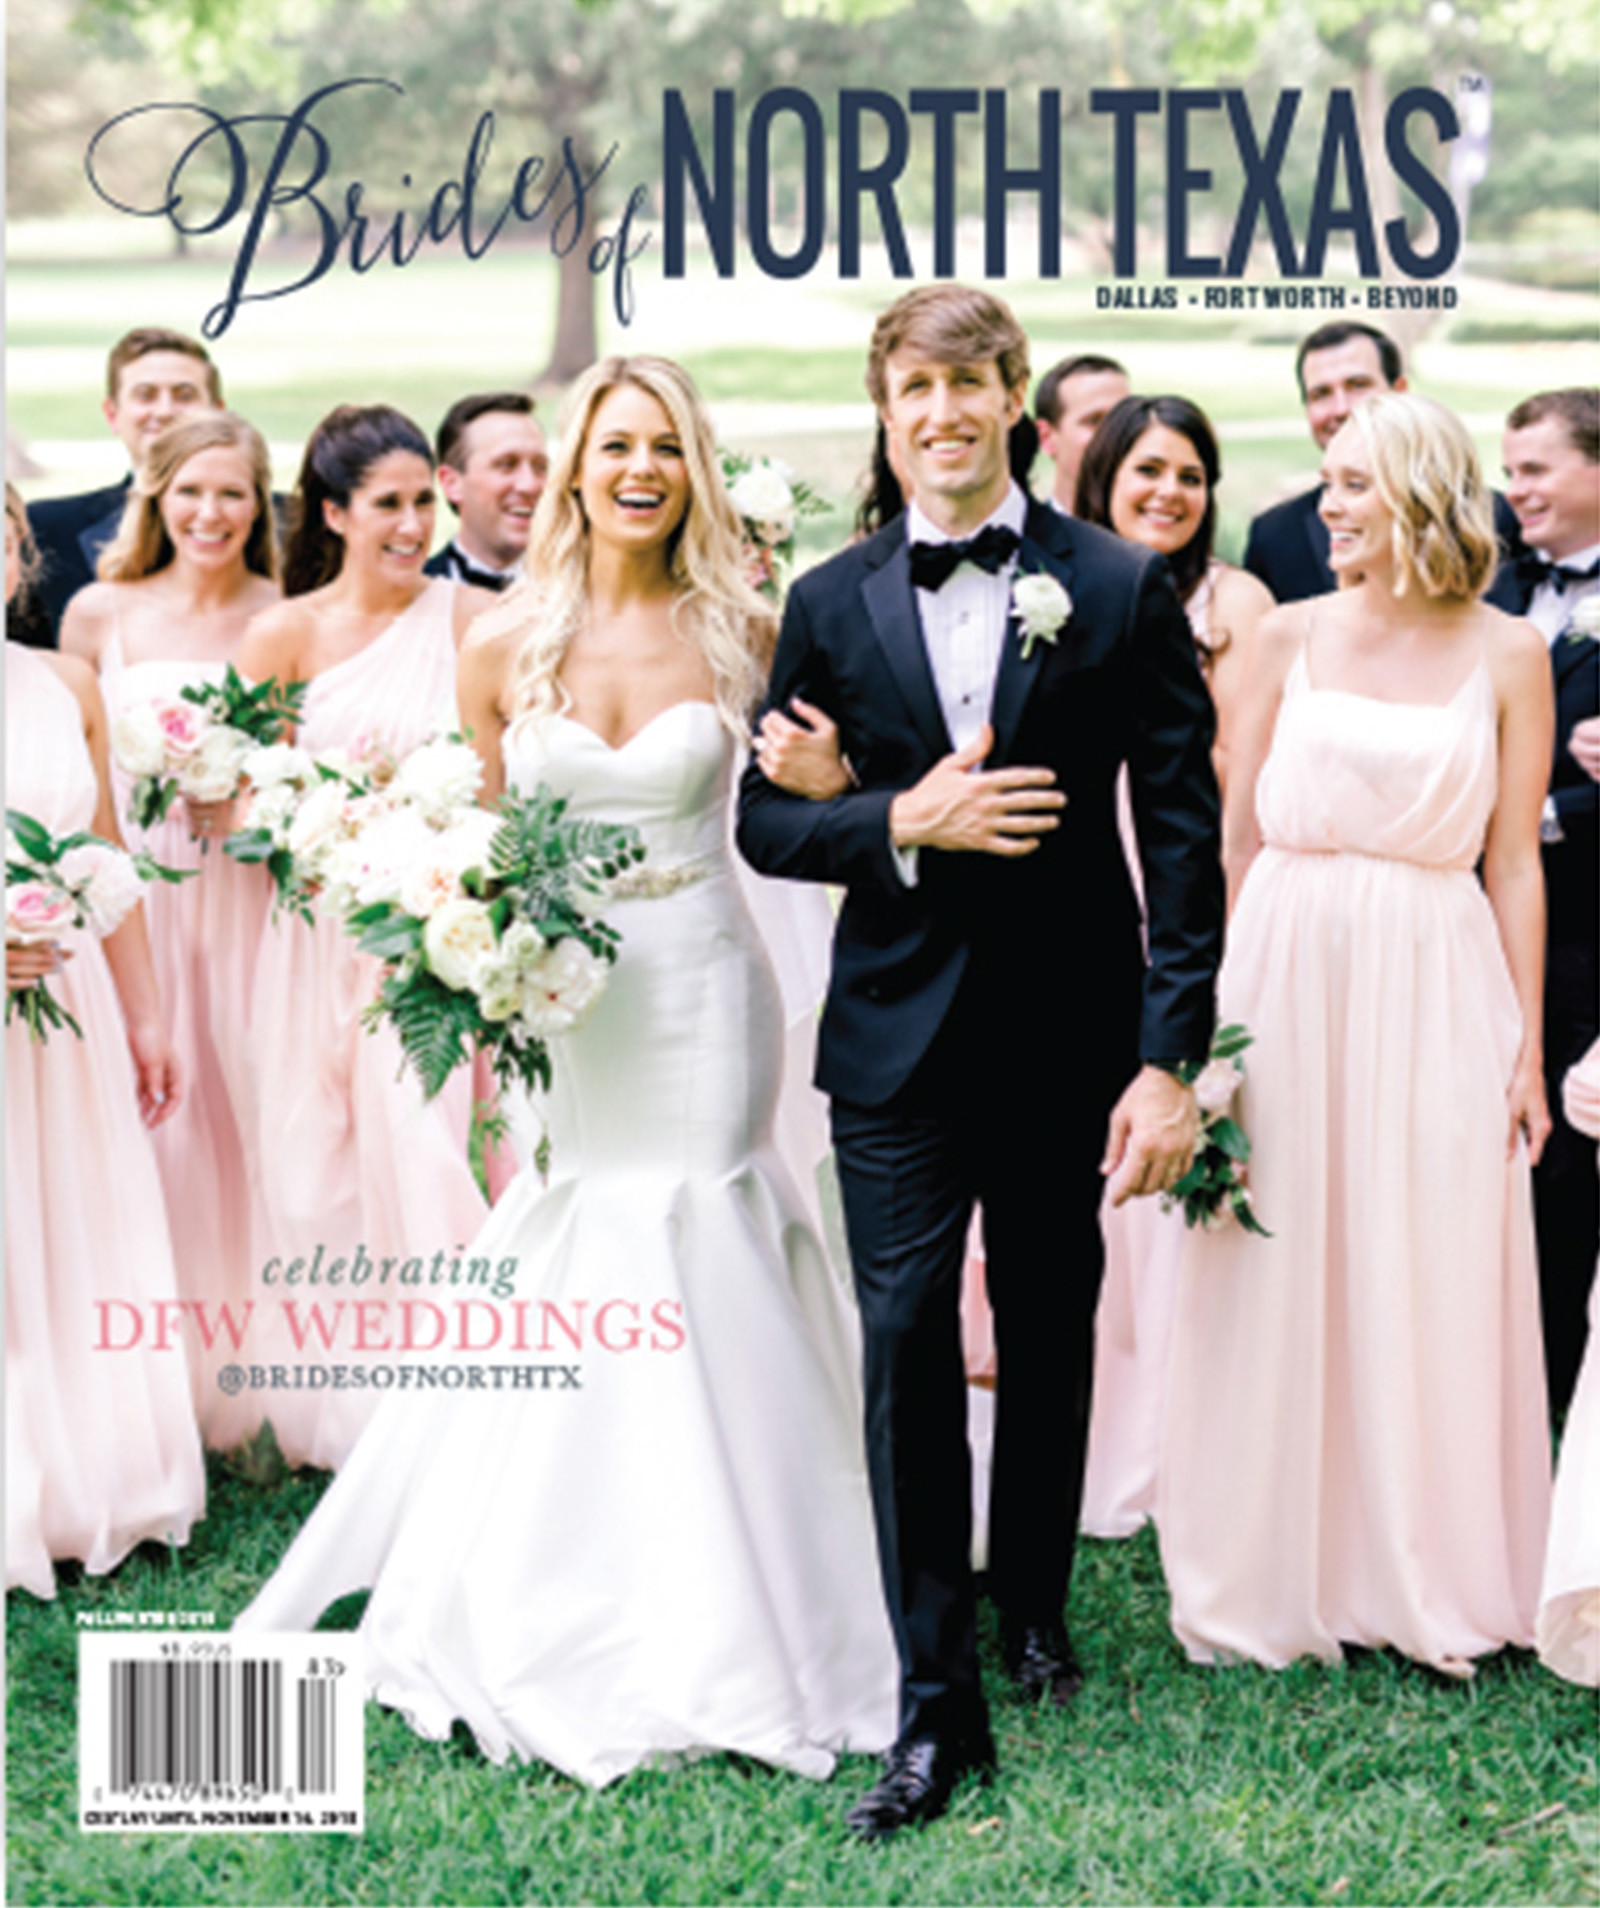 Gaun Pengantin Muslimah Modern Warna Silver Awesome Real Weddings Featured In Brides Of north Texas